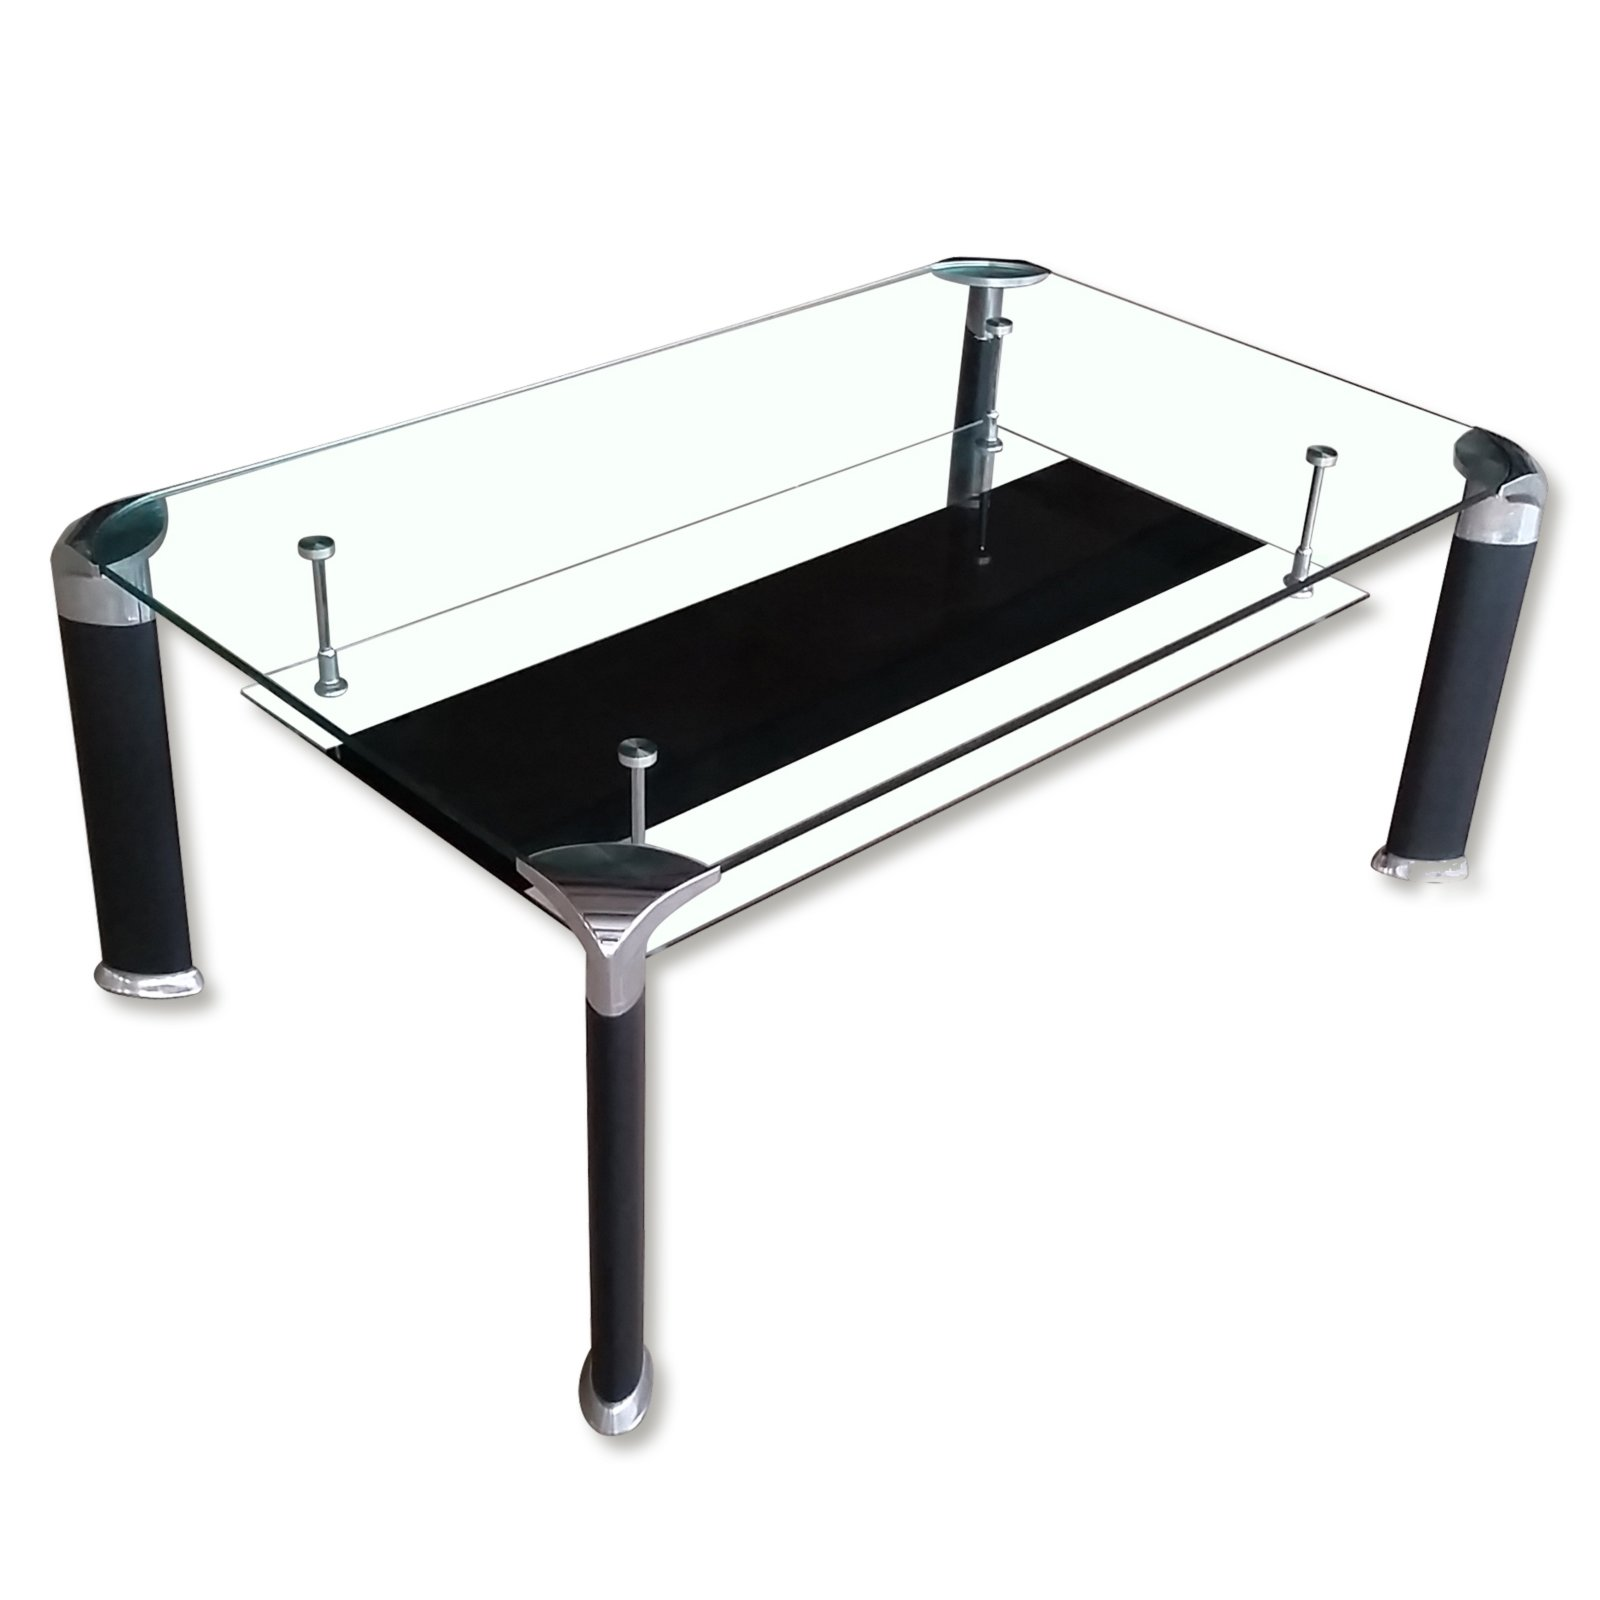 roller couchtisch glas energiemakeovernop. Black Bedroom Furniture Sets. Home Design Ideas